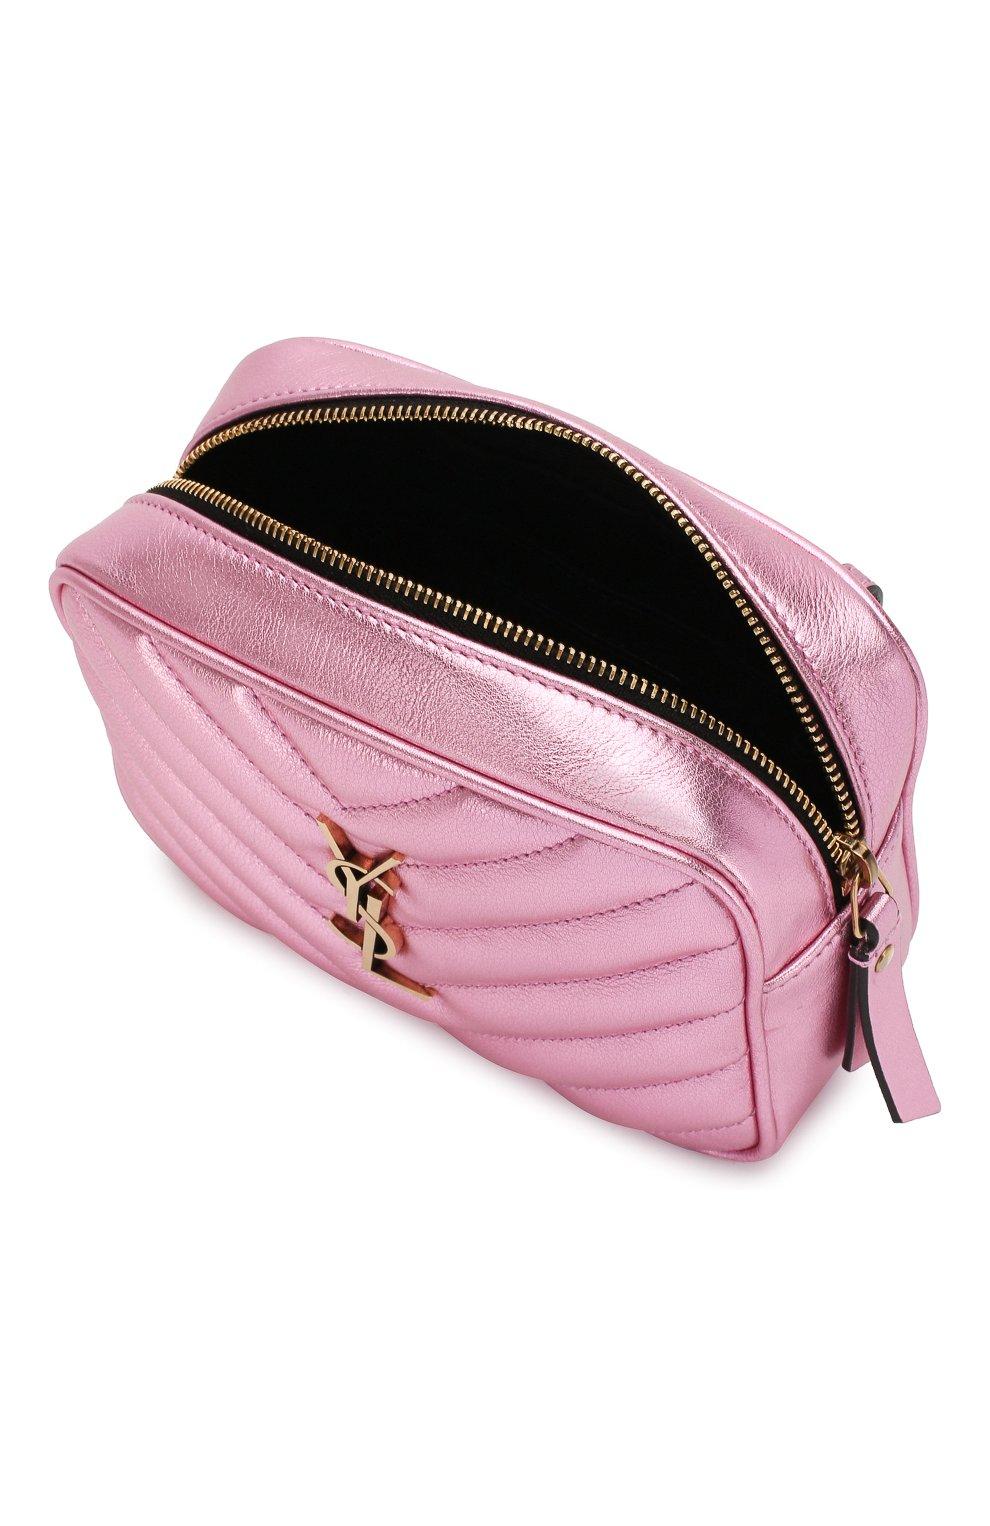 Женская поясная сумка lou SAINT LAURENT розового цвета, арт. 534817/09E0W   Фото 4